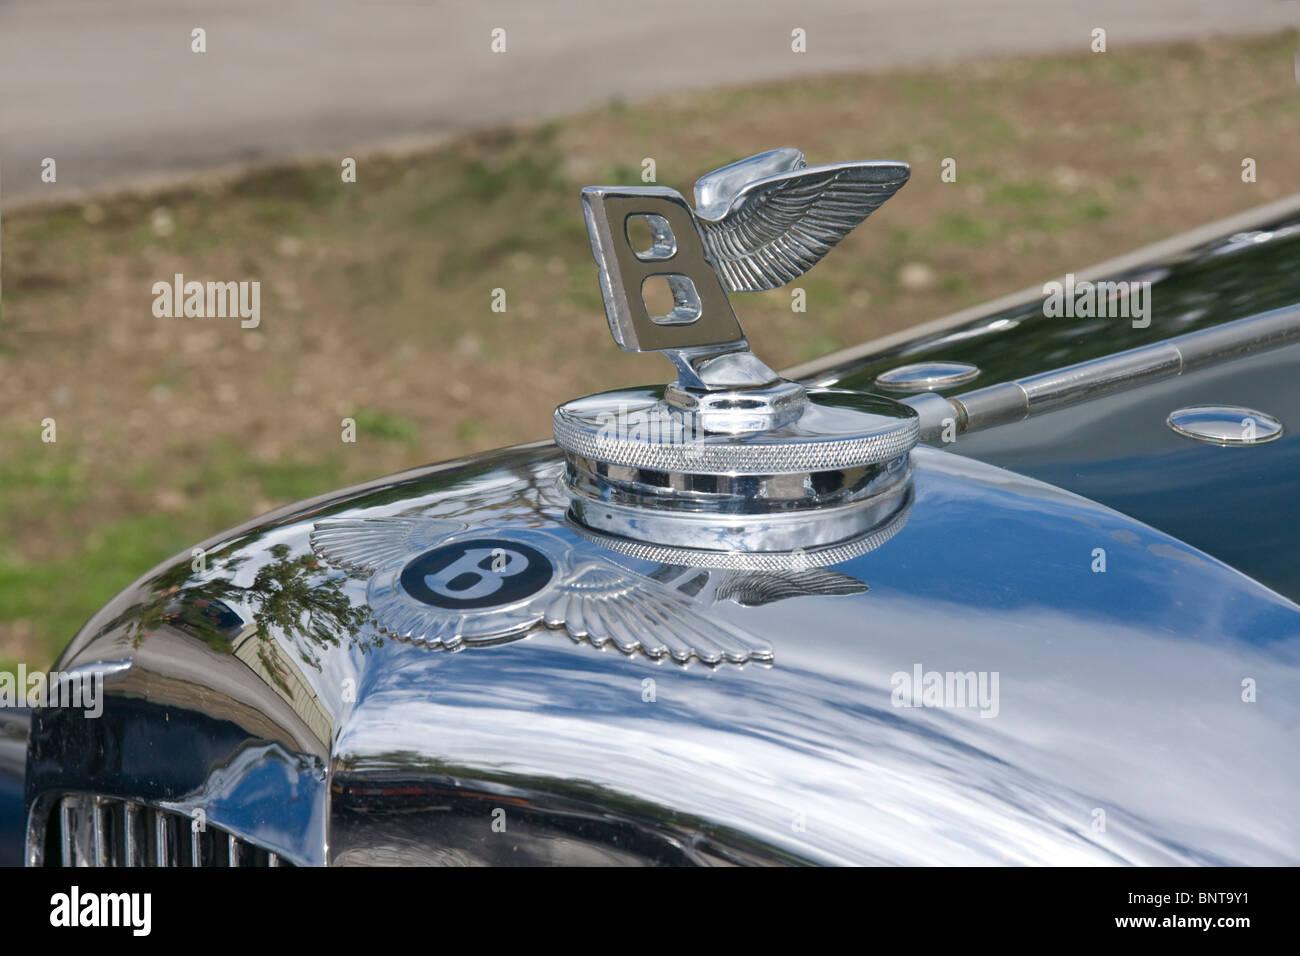 Radiator badge and emblem on a 1936 Bentley motor car. - Stock Image